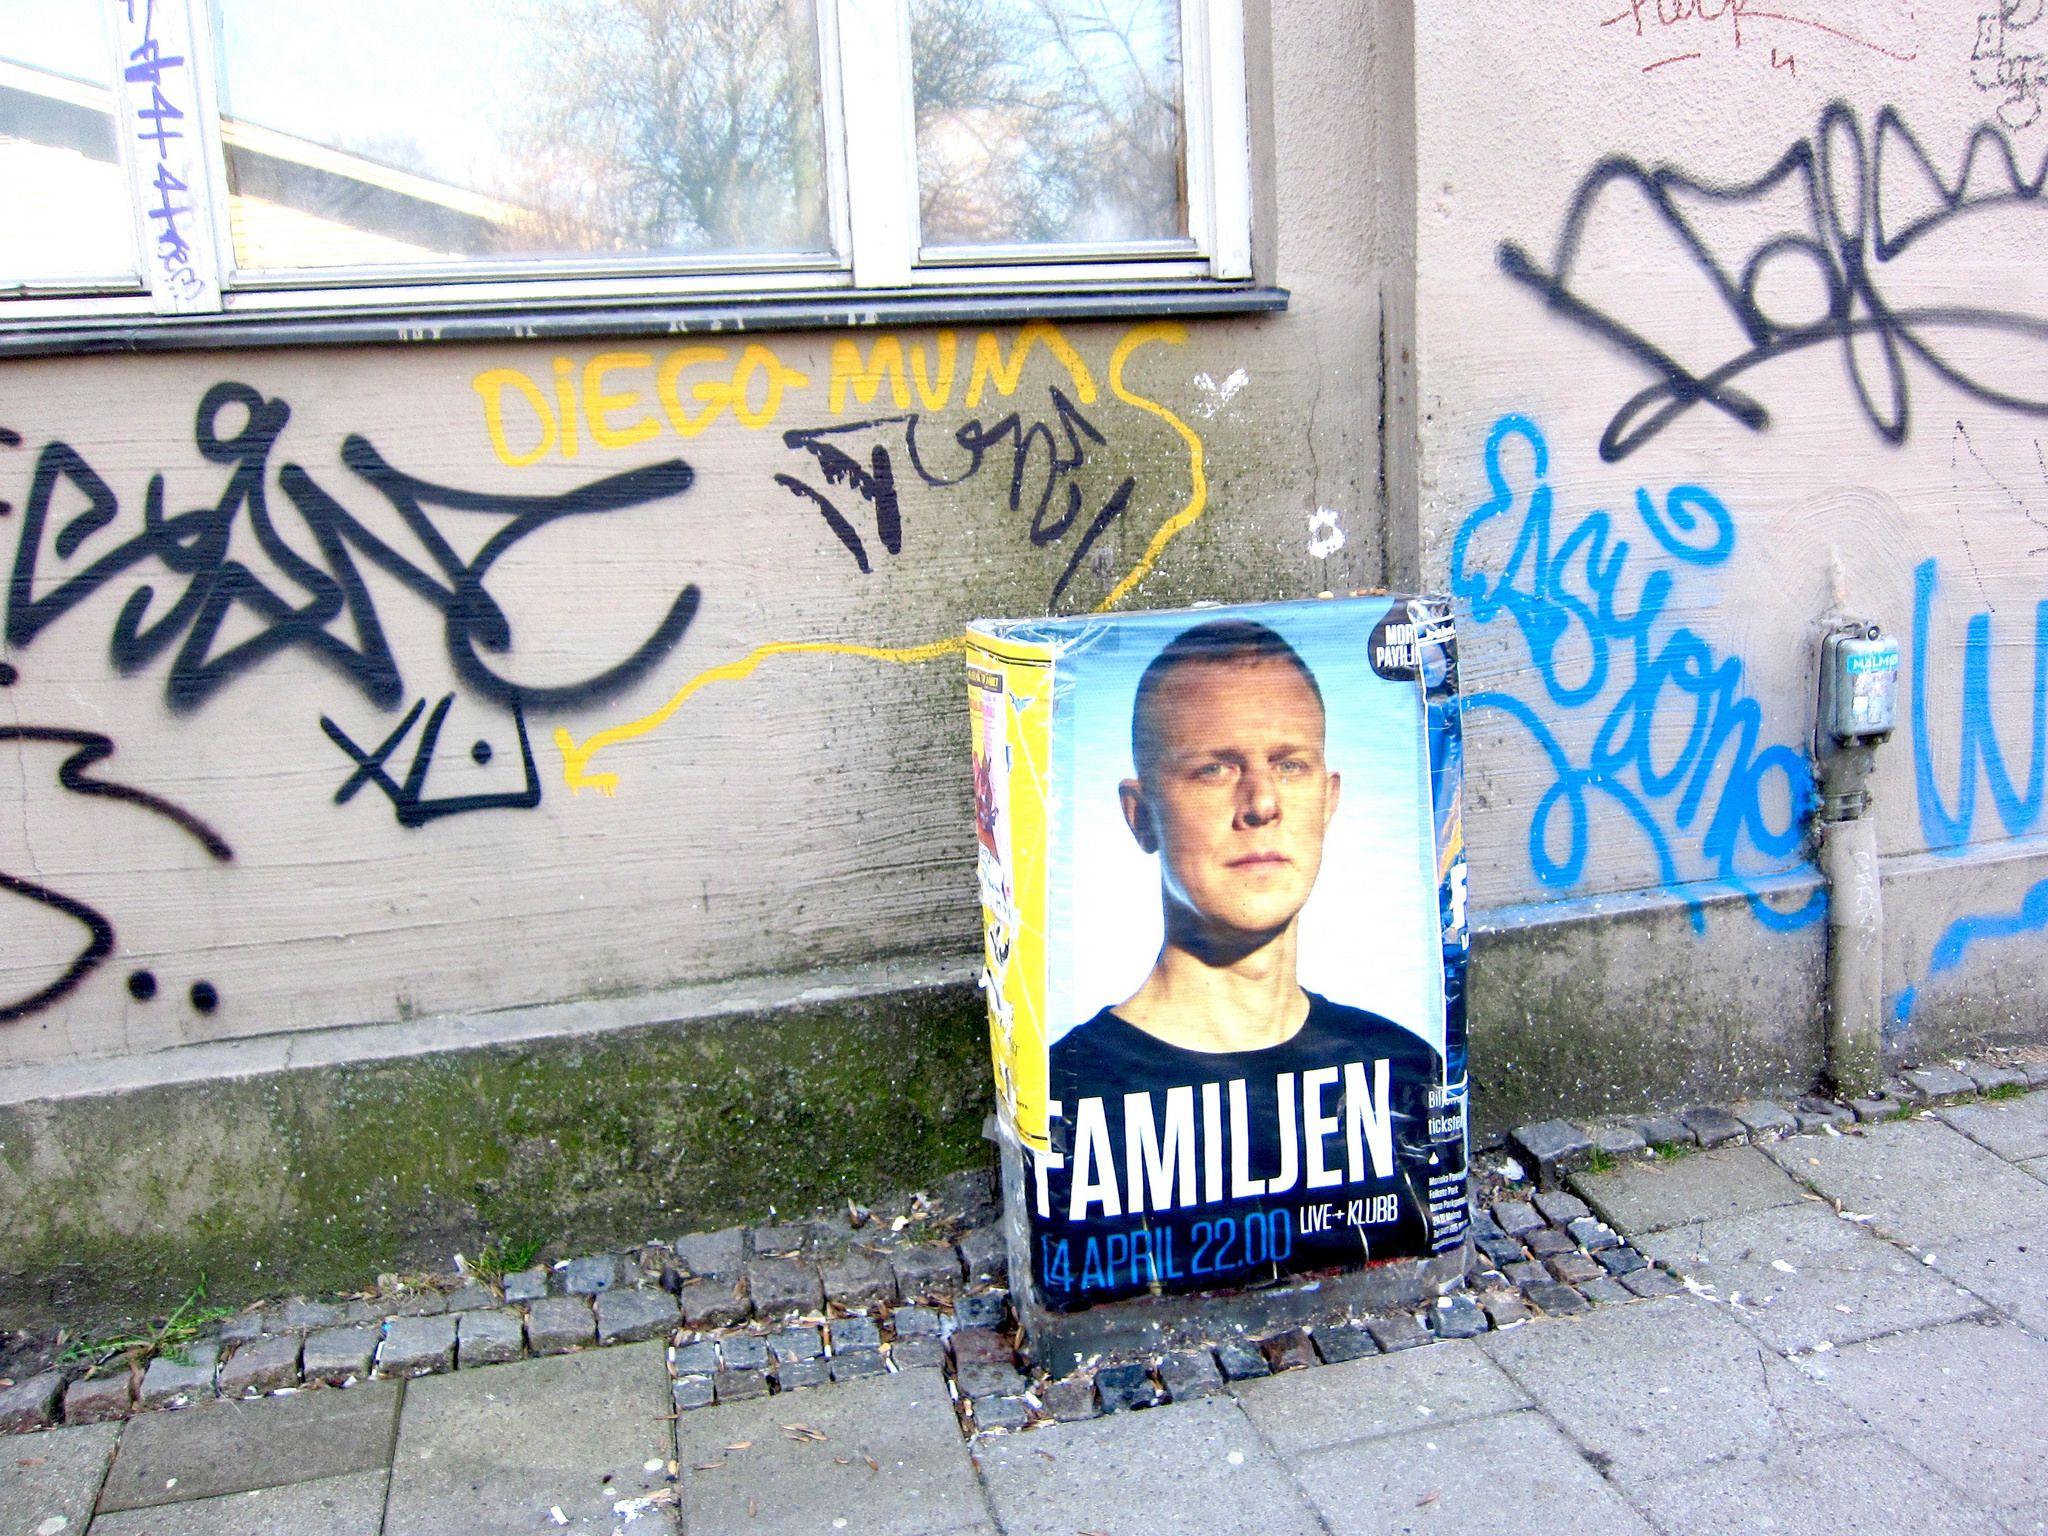 Street Poster Tag Graffiti Pavement Side Walk Guy Sprayed